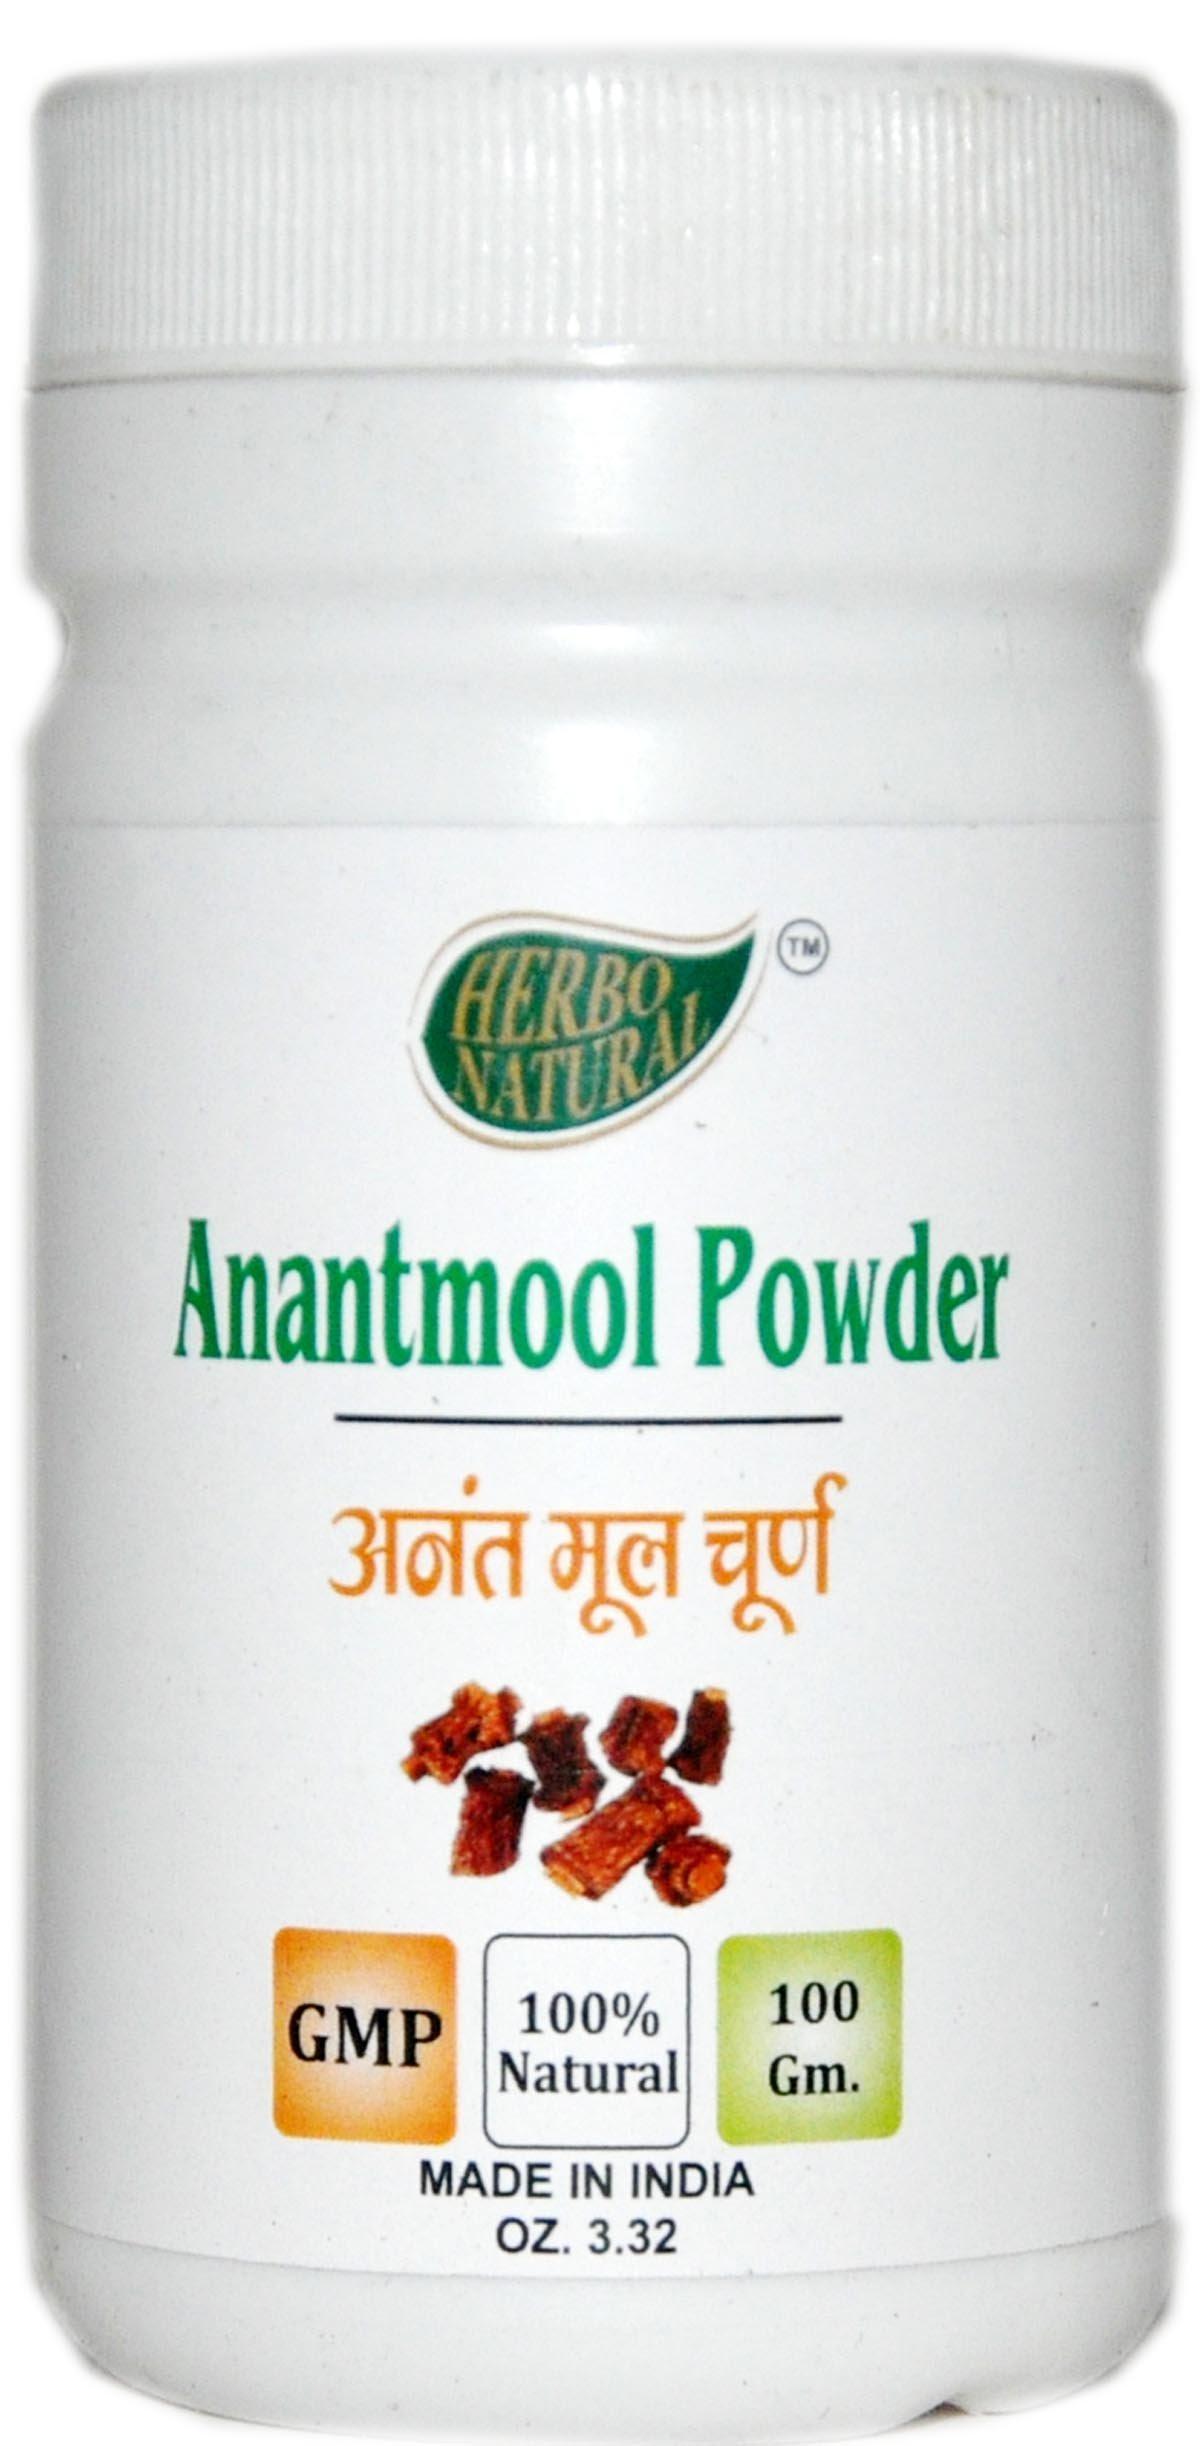 Herbo Natural AyurVedic Indian Sarsaparilla Powder (Anantmool Powder) (100 gm/3.52oz) GMP Certified (Pack of 1)